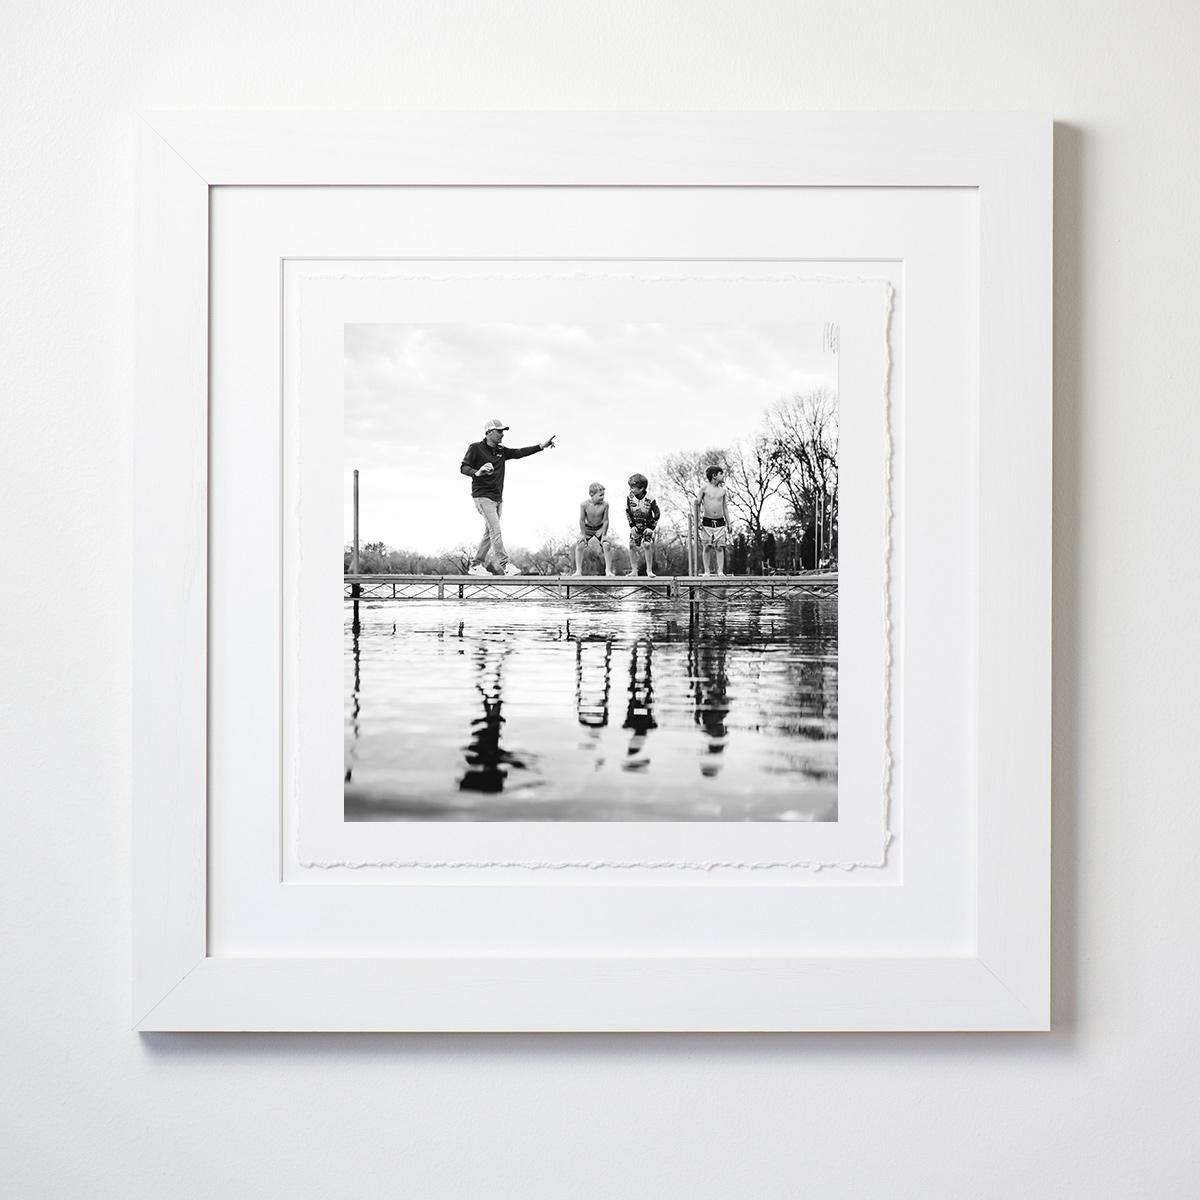 Musea_deckle_white frame_BW.jpg